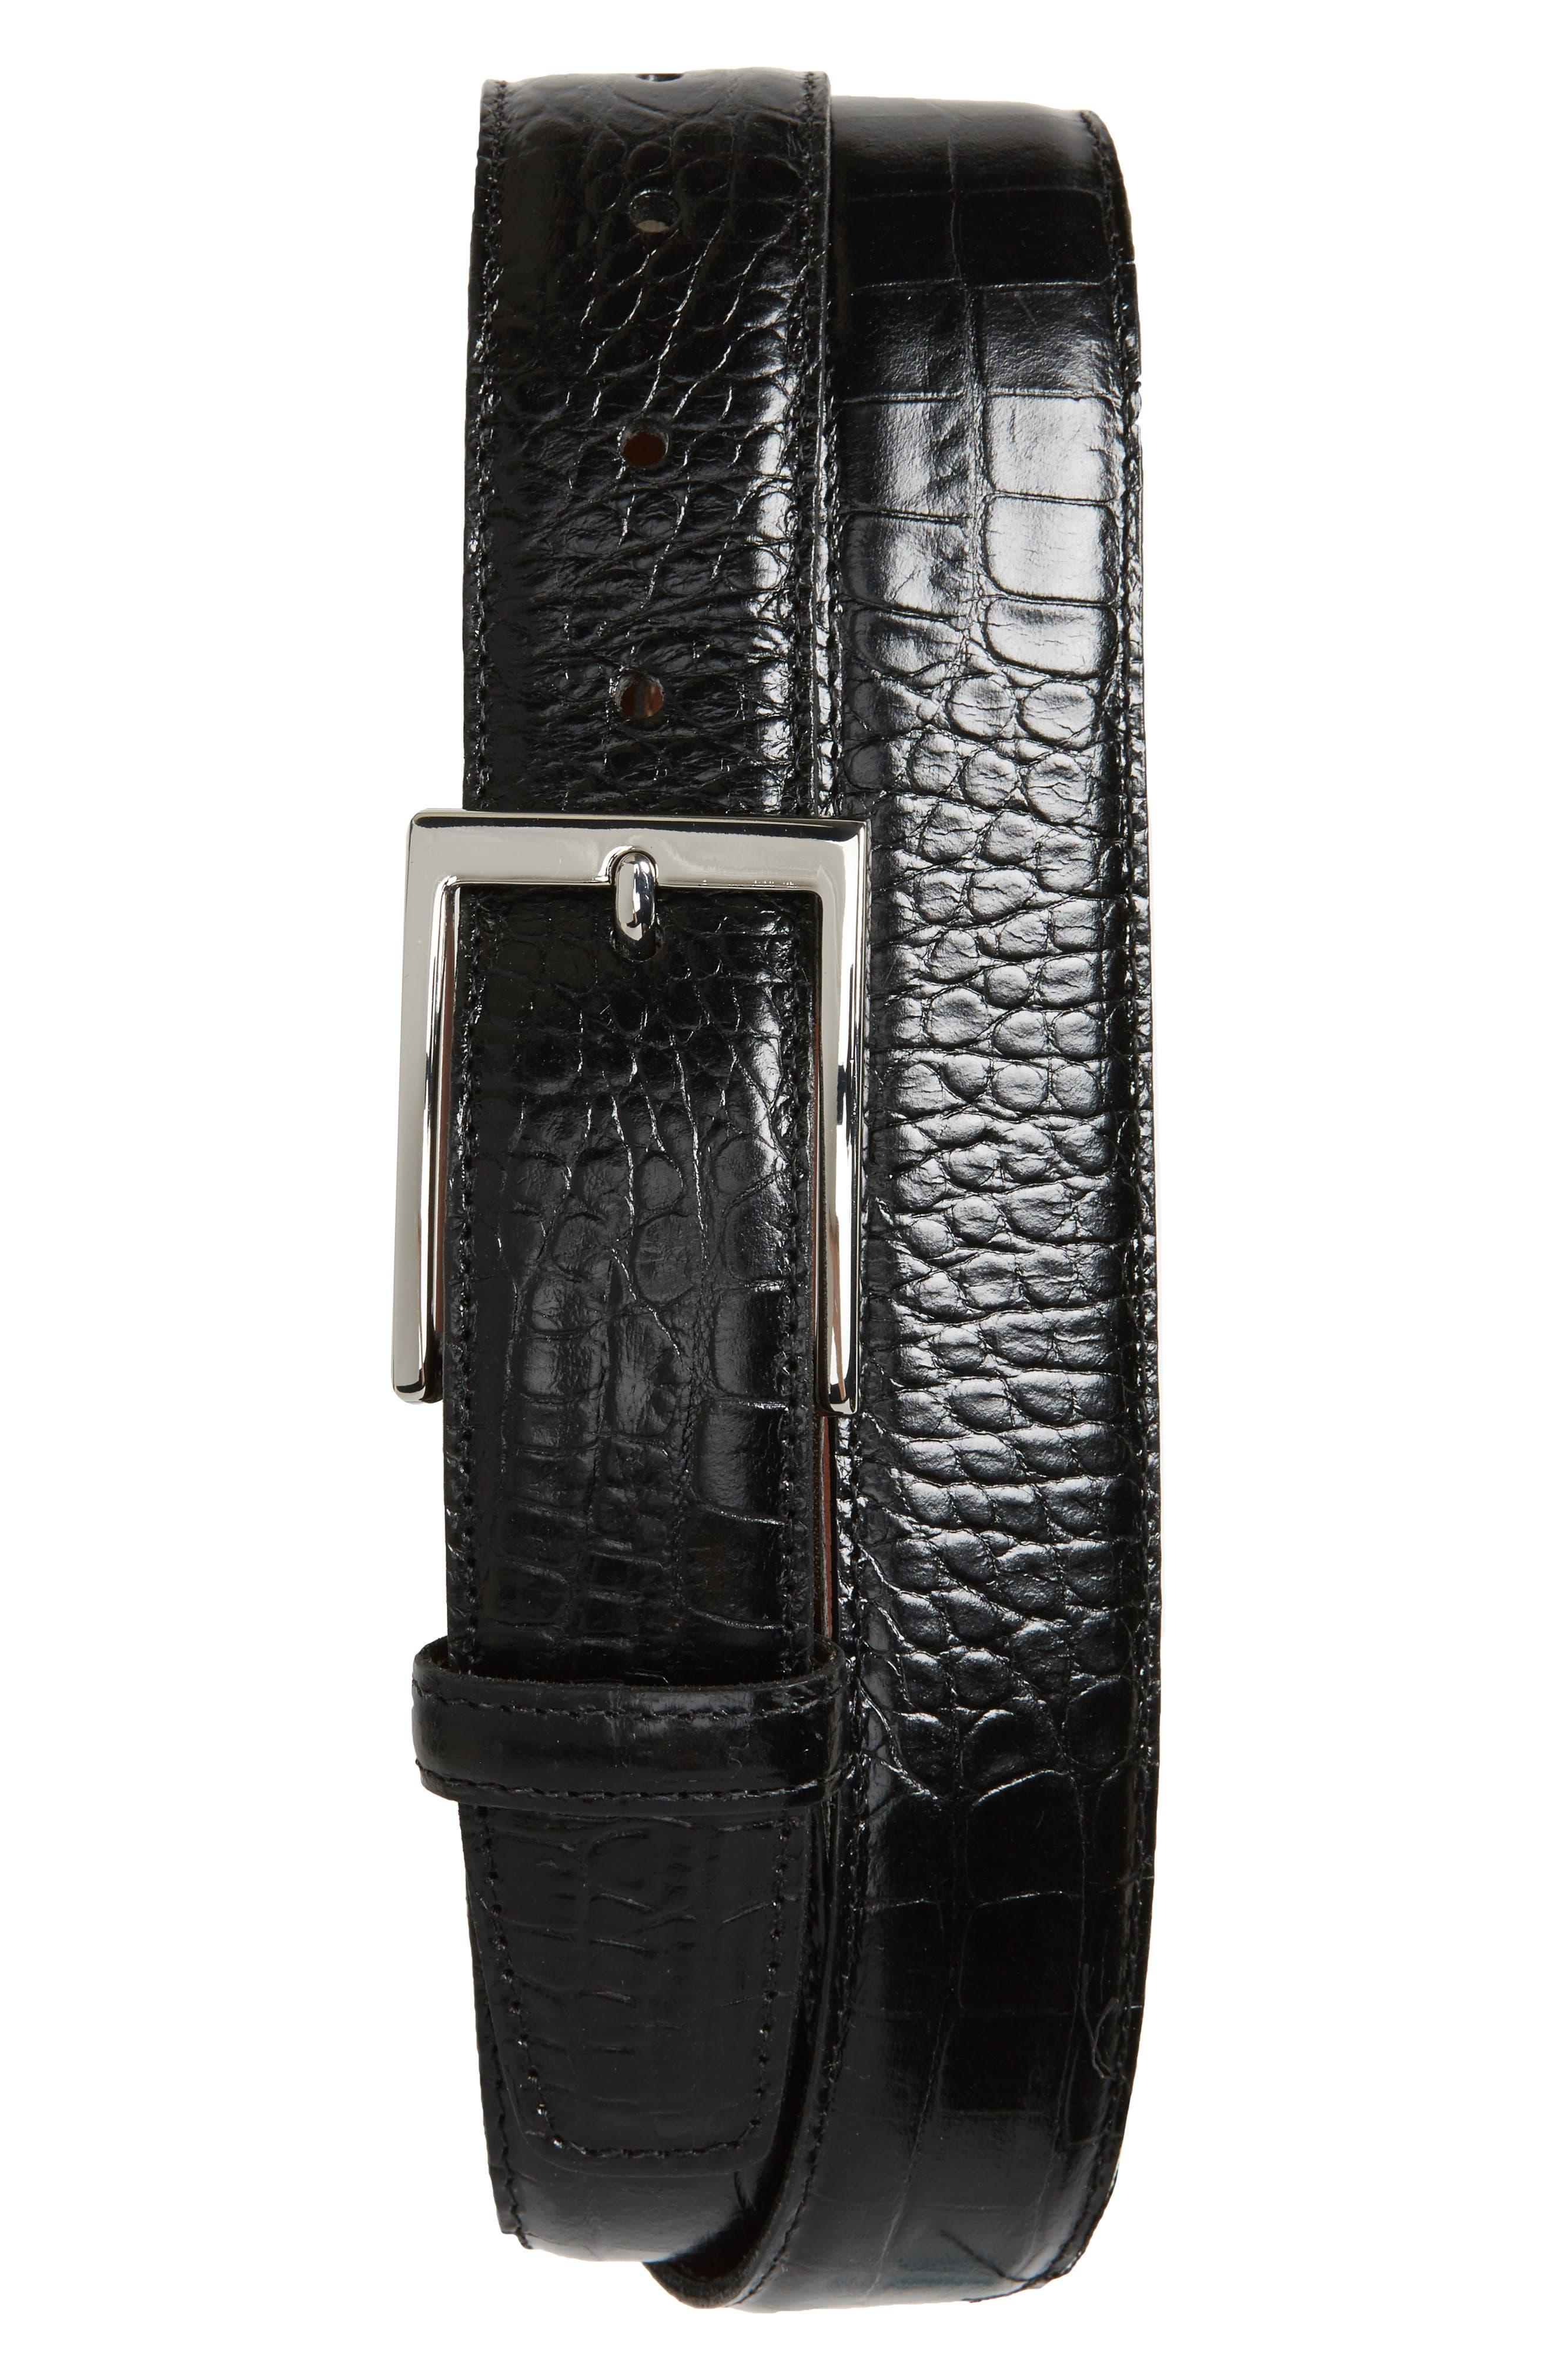 Gator Grain Embossed Leather Belt,                         Main,                         color, Black